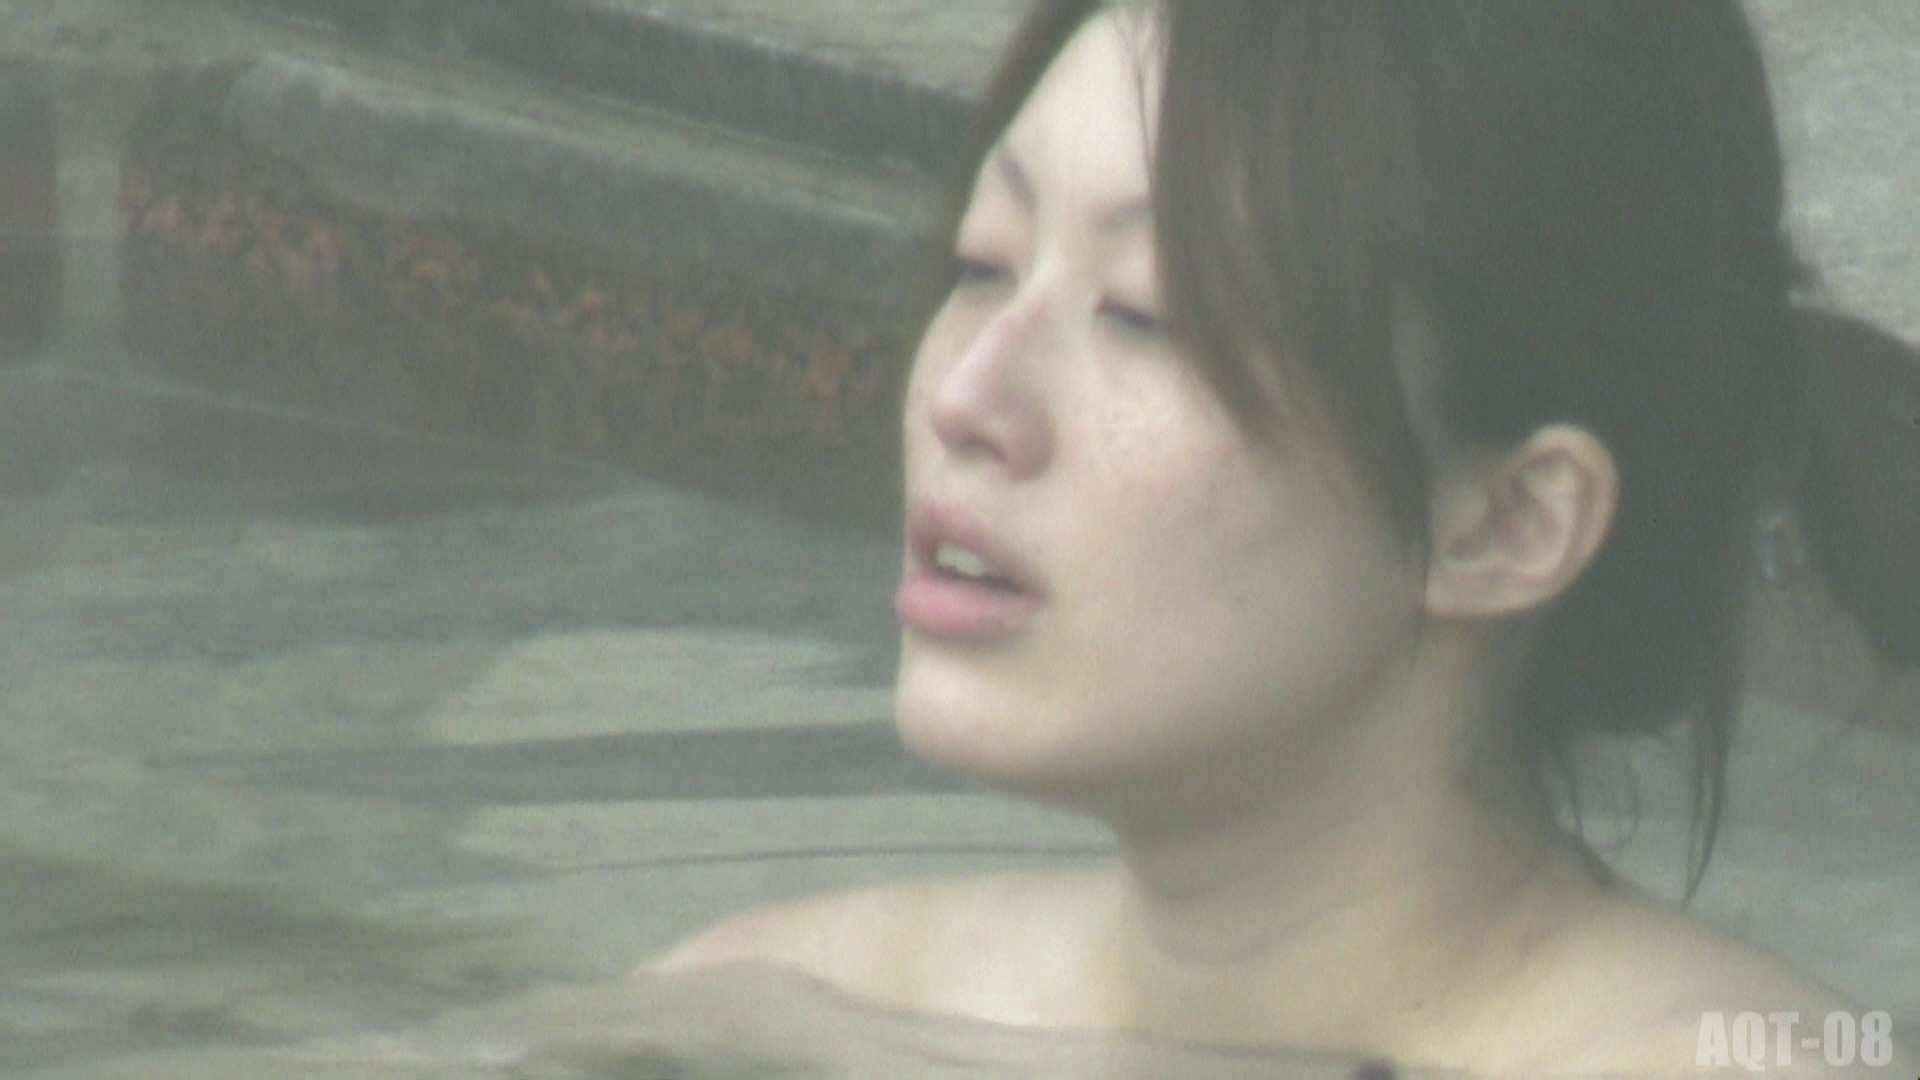 Aquaな露天風呂Vol.775 露天風呂編 | 盗撮シリーズ  78PIX 31